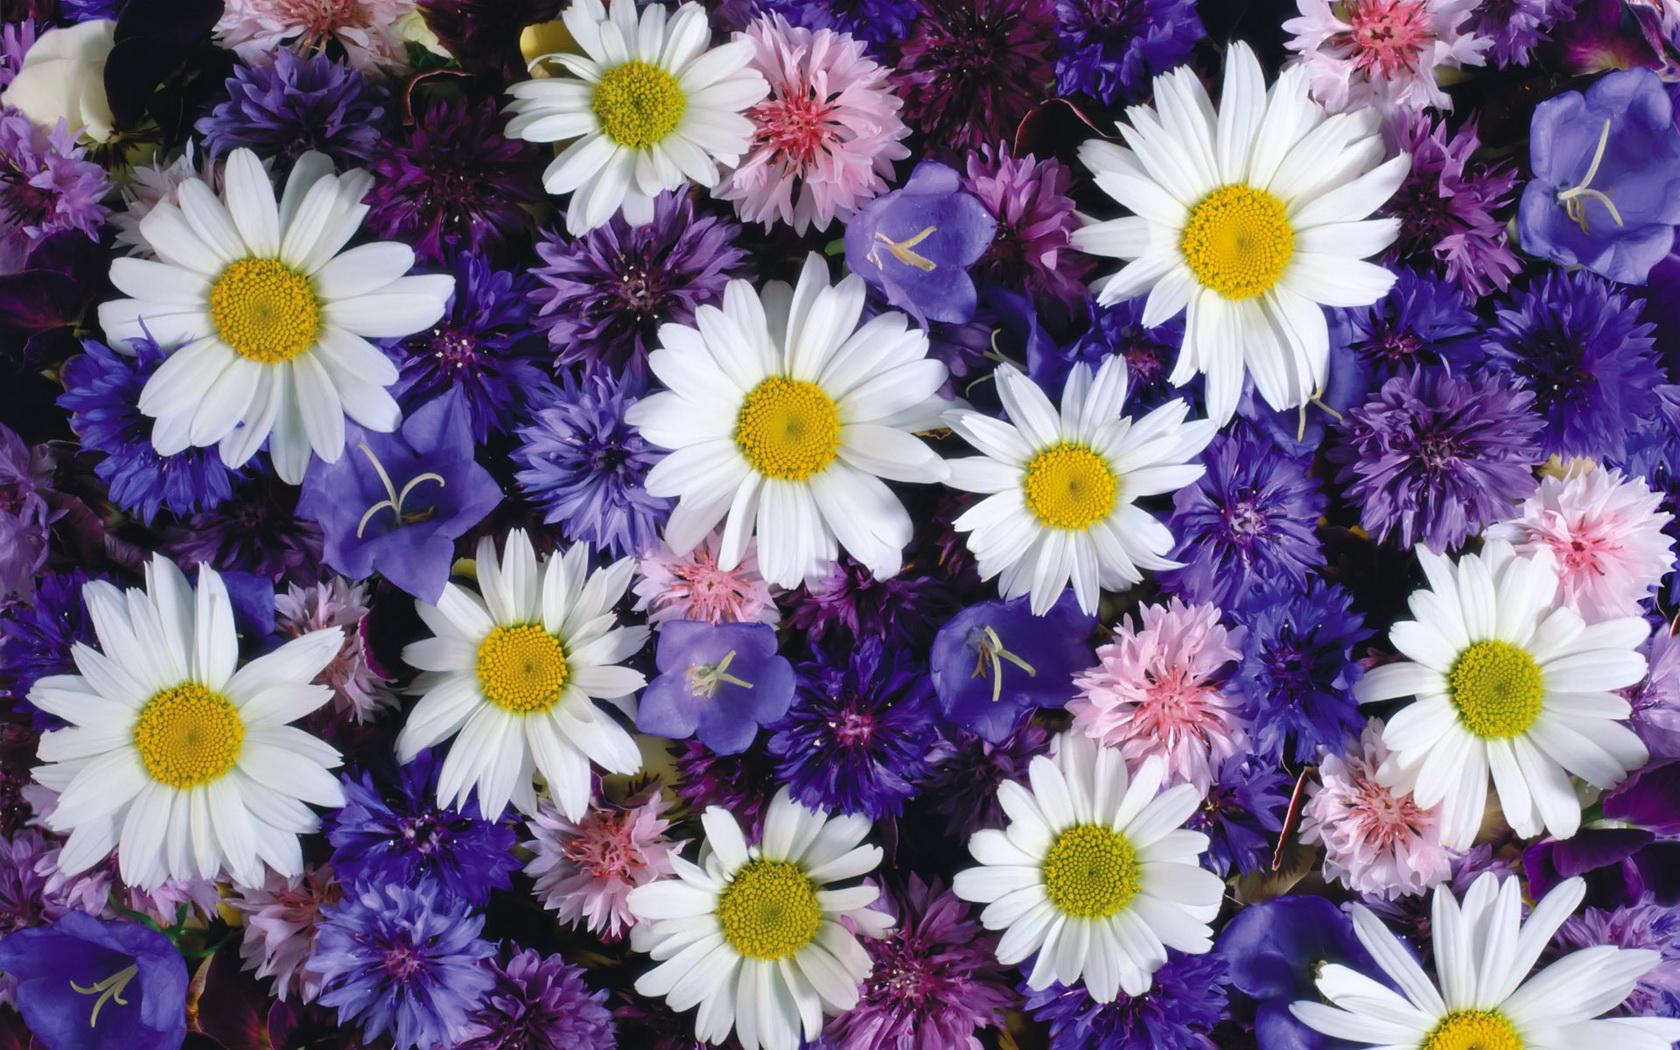 ромашки картинки цветы